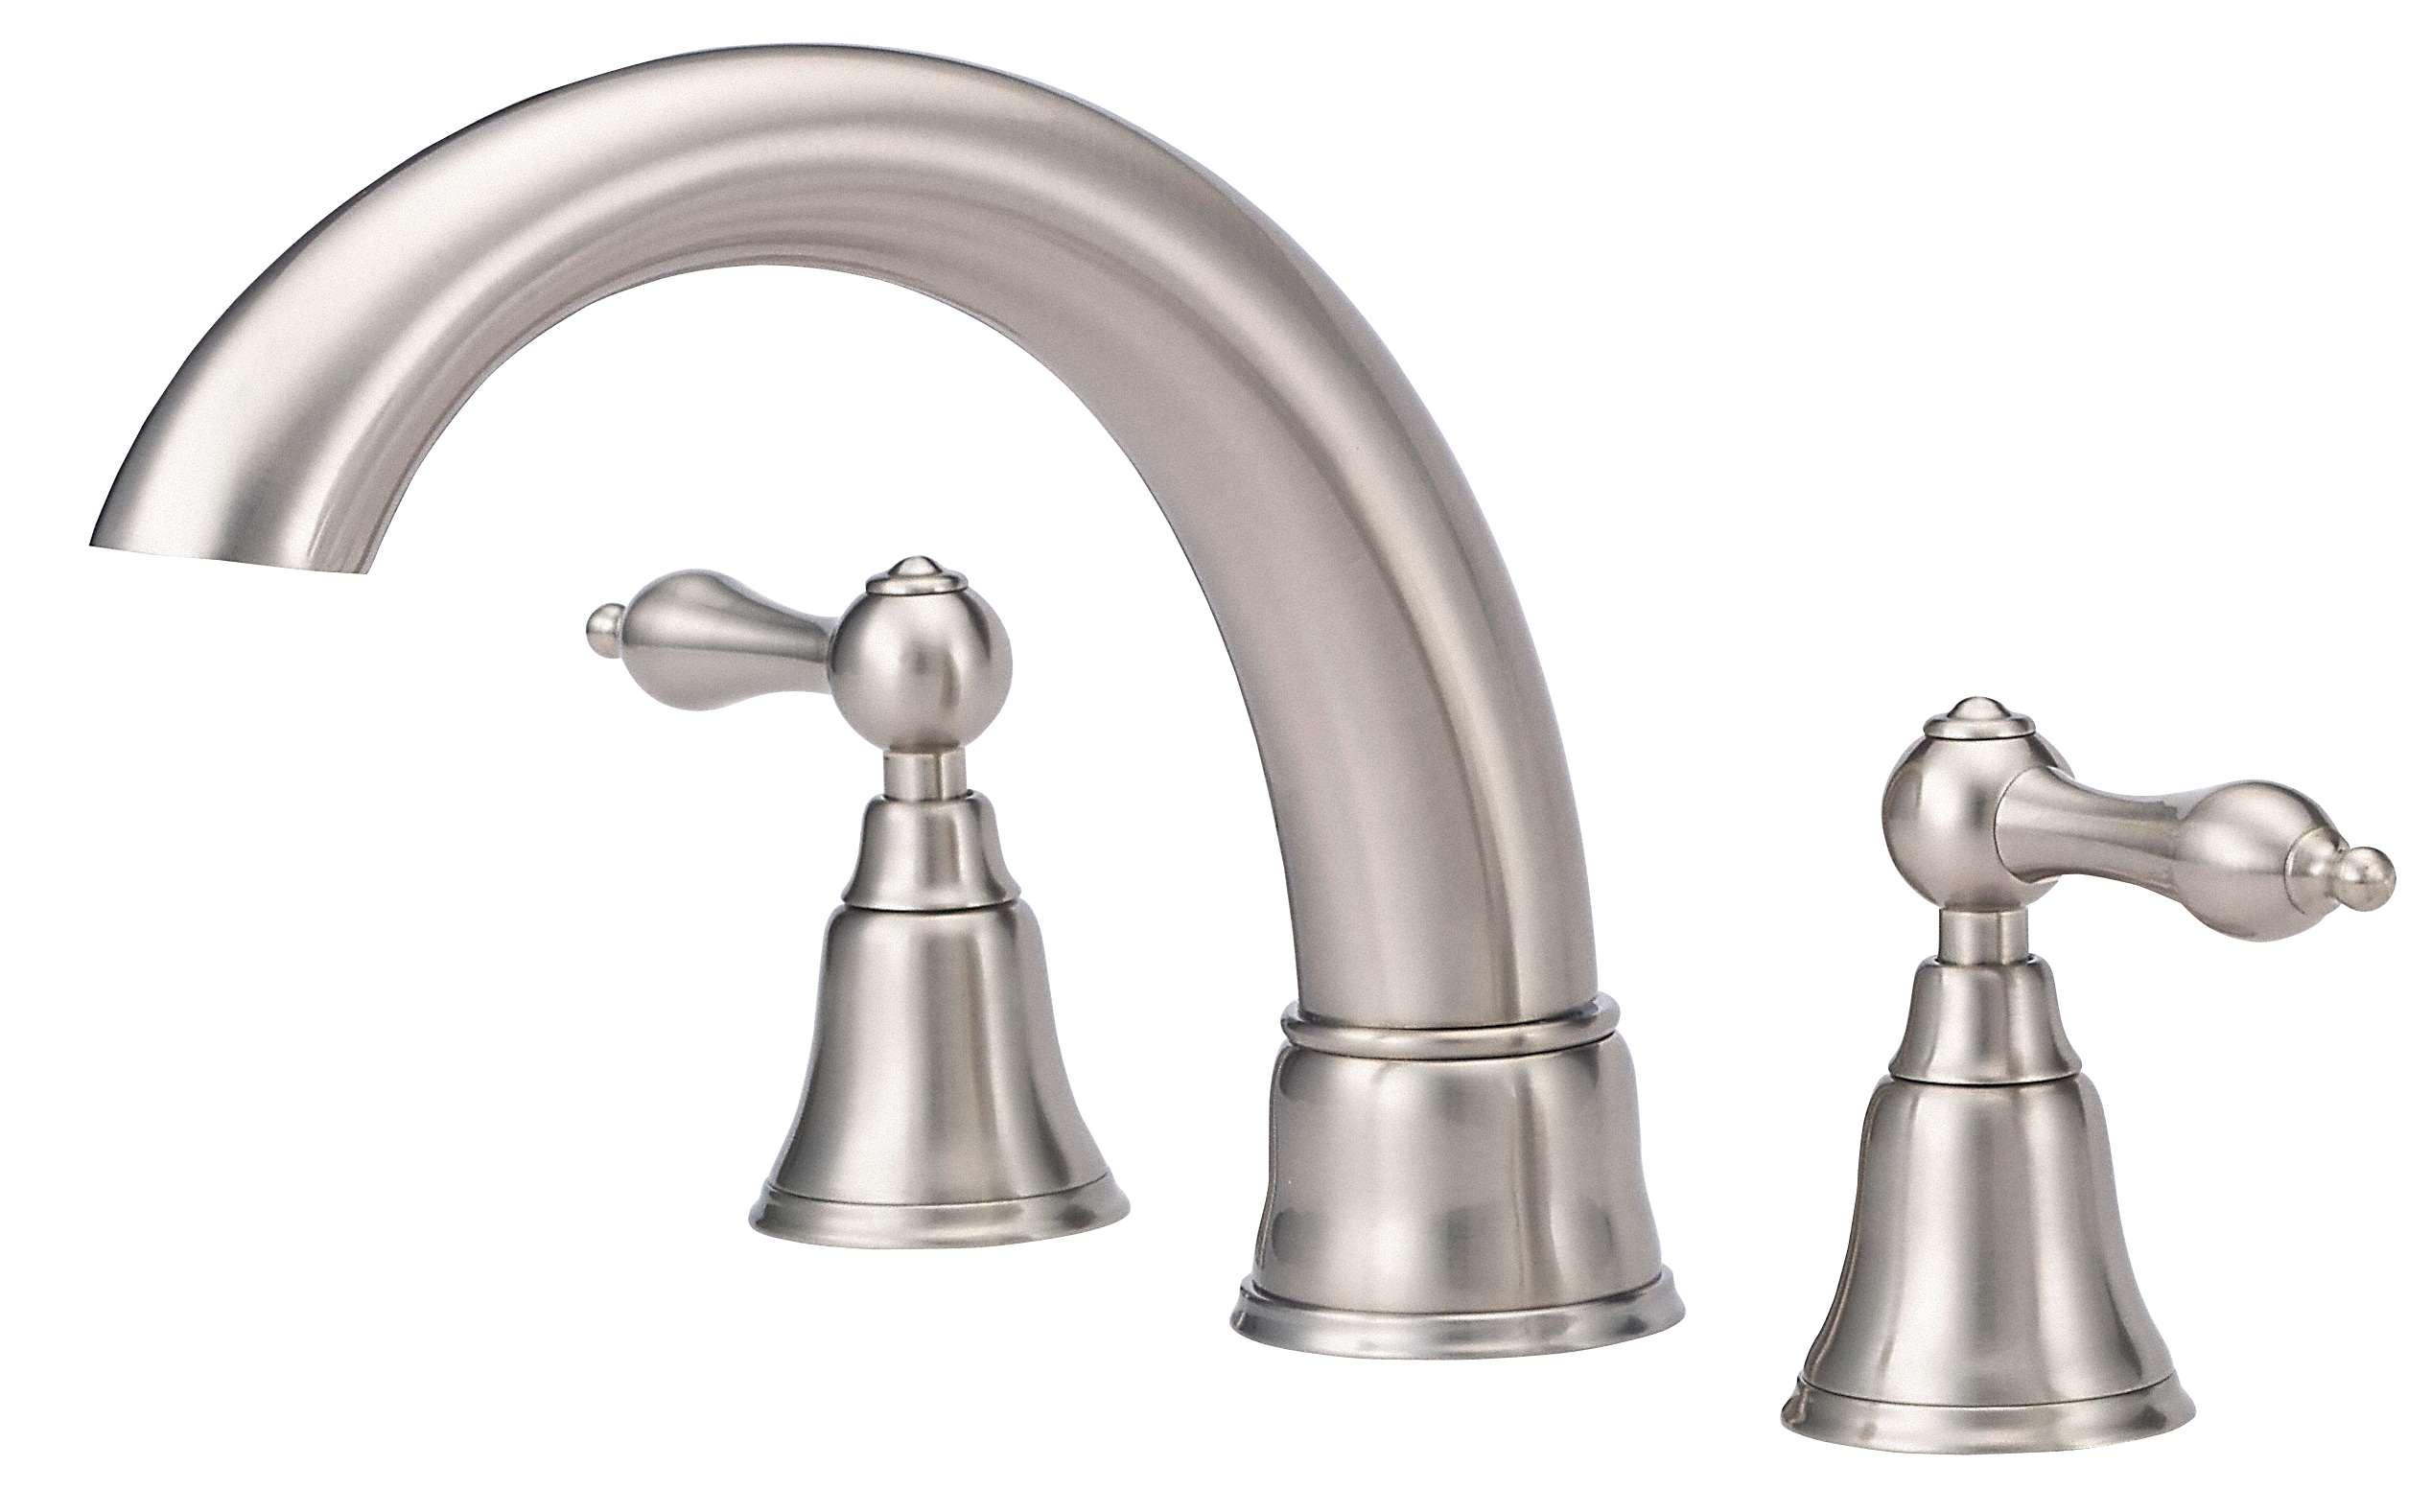 Danze D308840bnt Fairmont Roman Tub Faucet Trim Kit Brushed Nickel Ebay